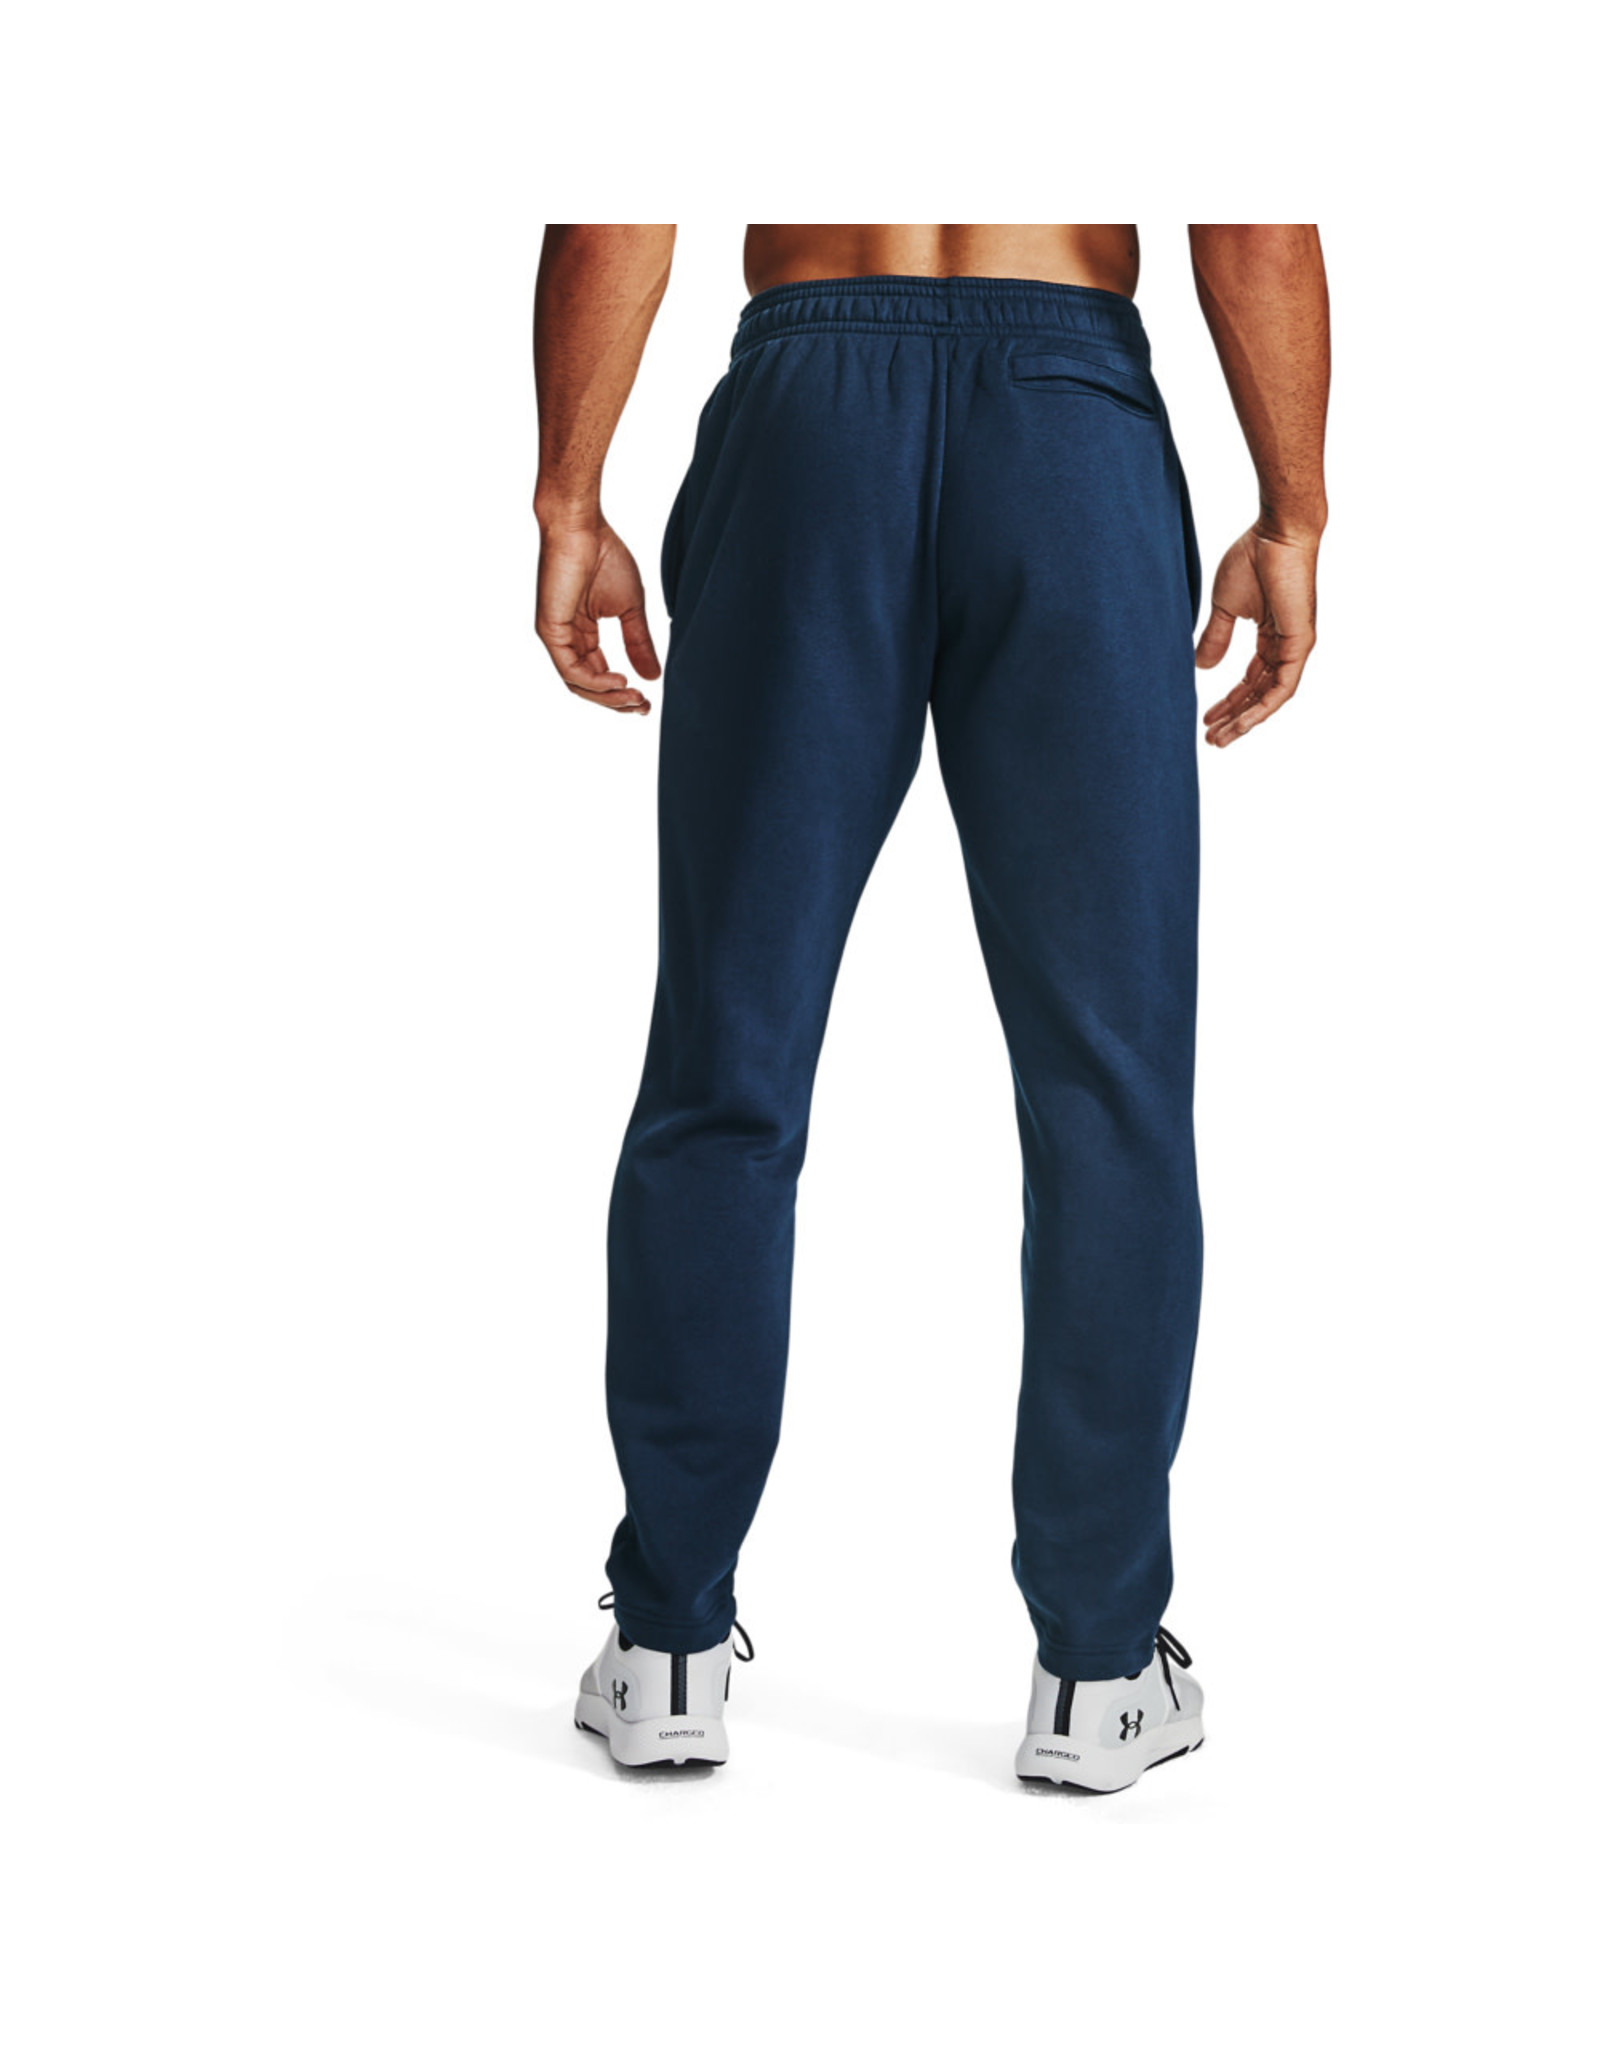 Under Armour UA Rival Fleece Pants - Navy